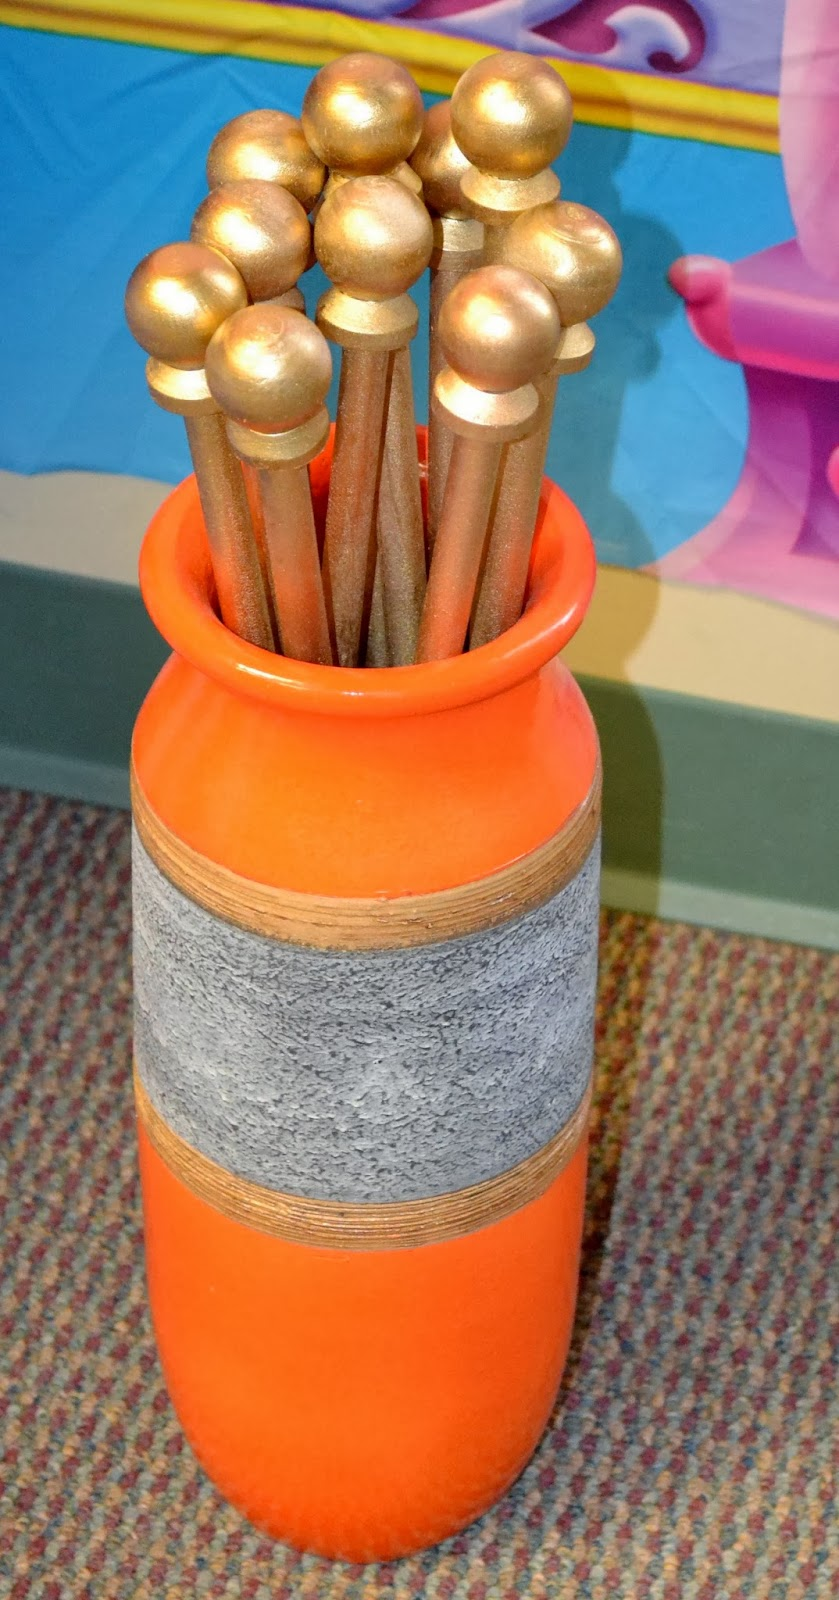 http://kidsbibledebjackson.blogspot.com/2012/08/esther.html